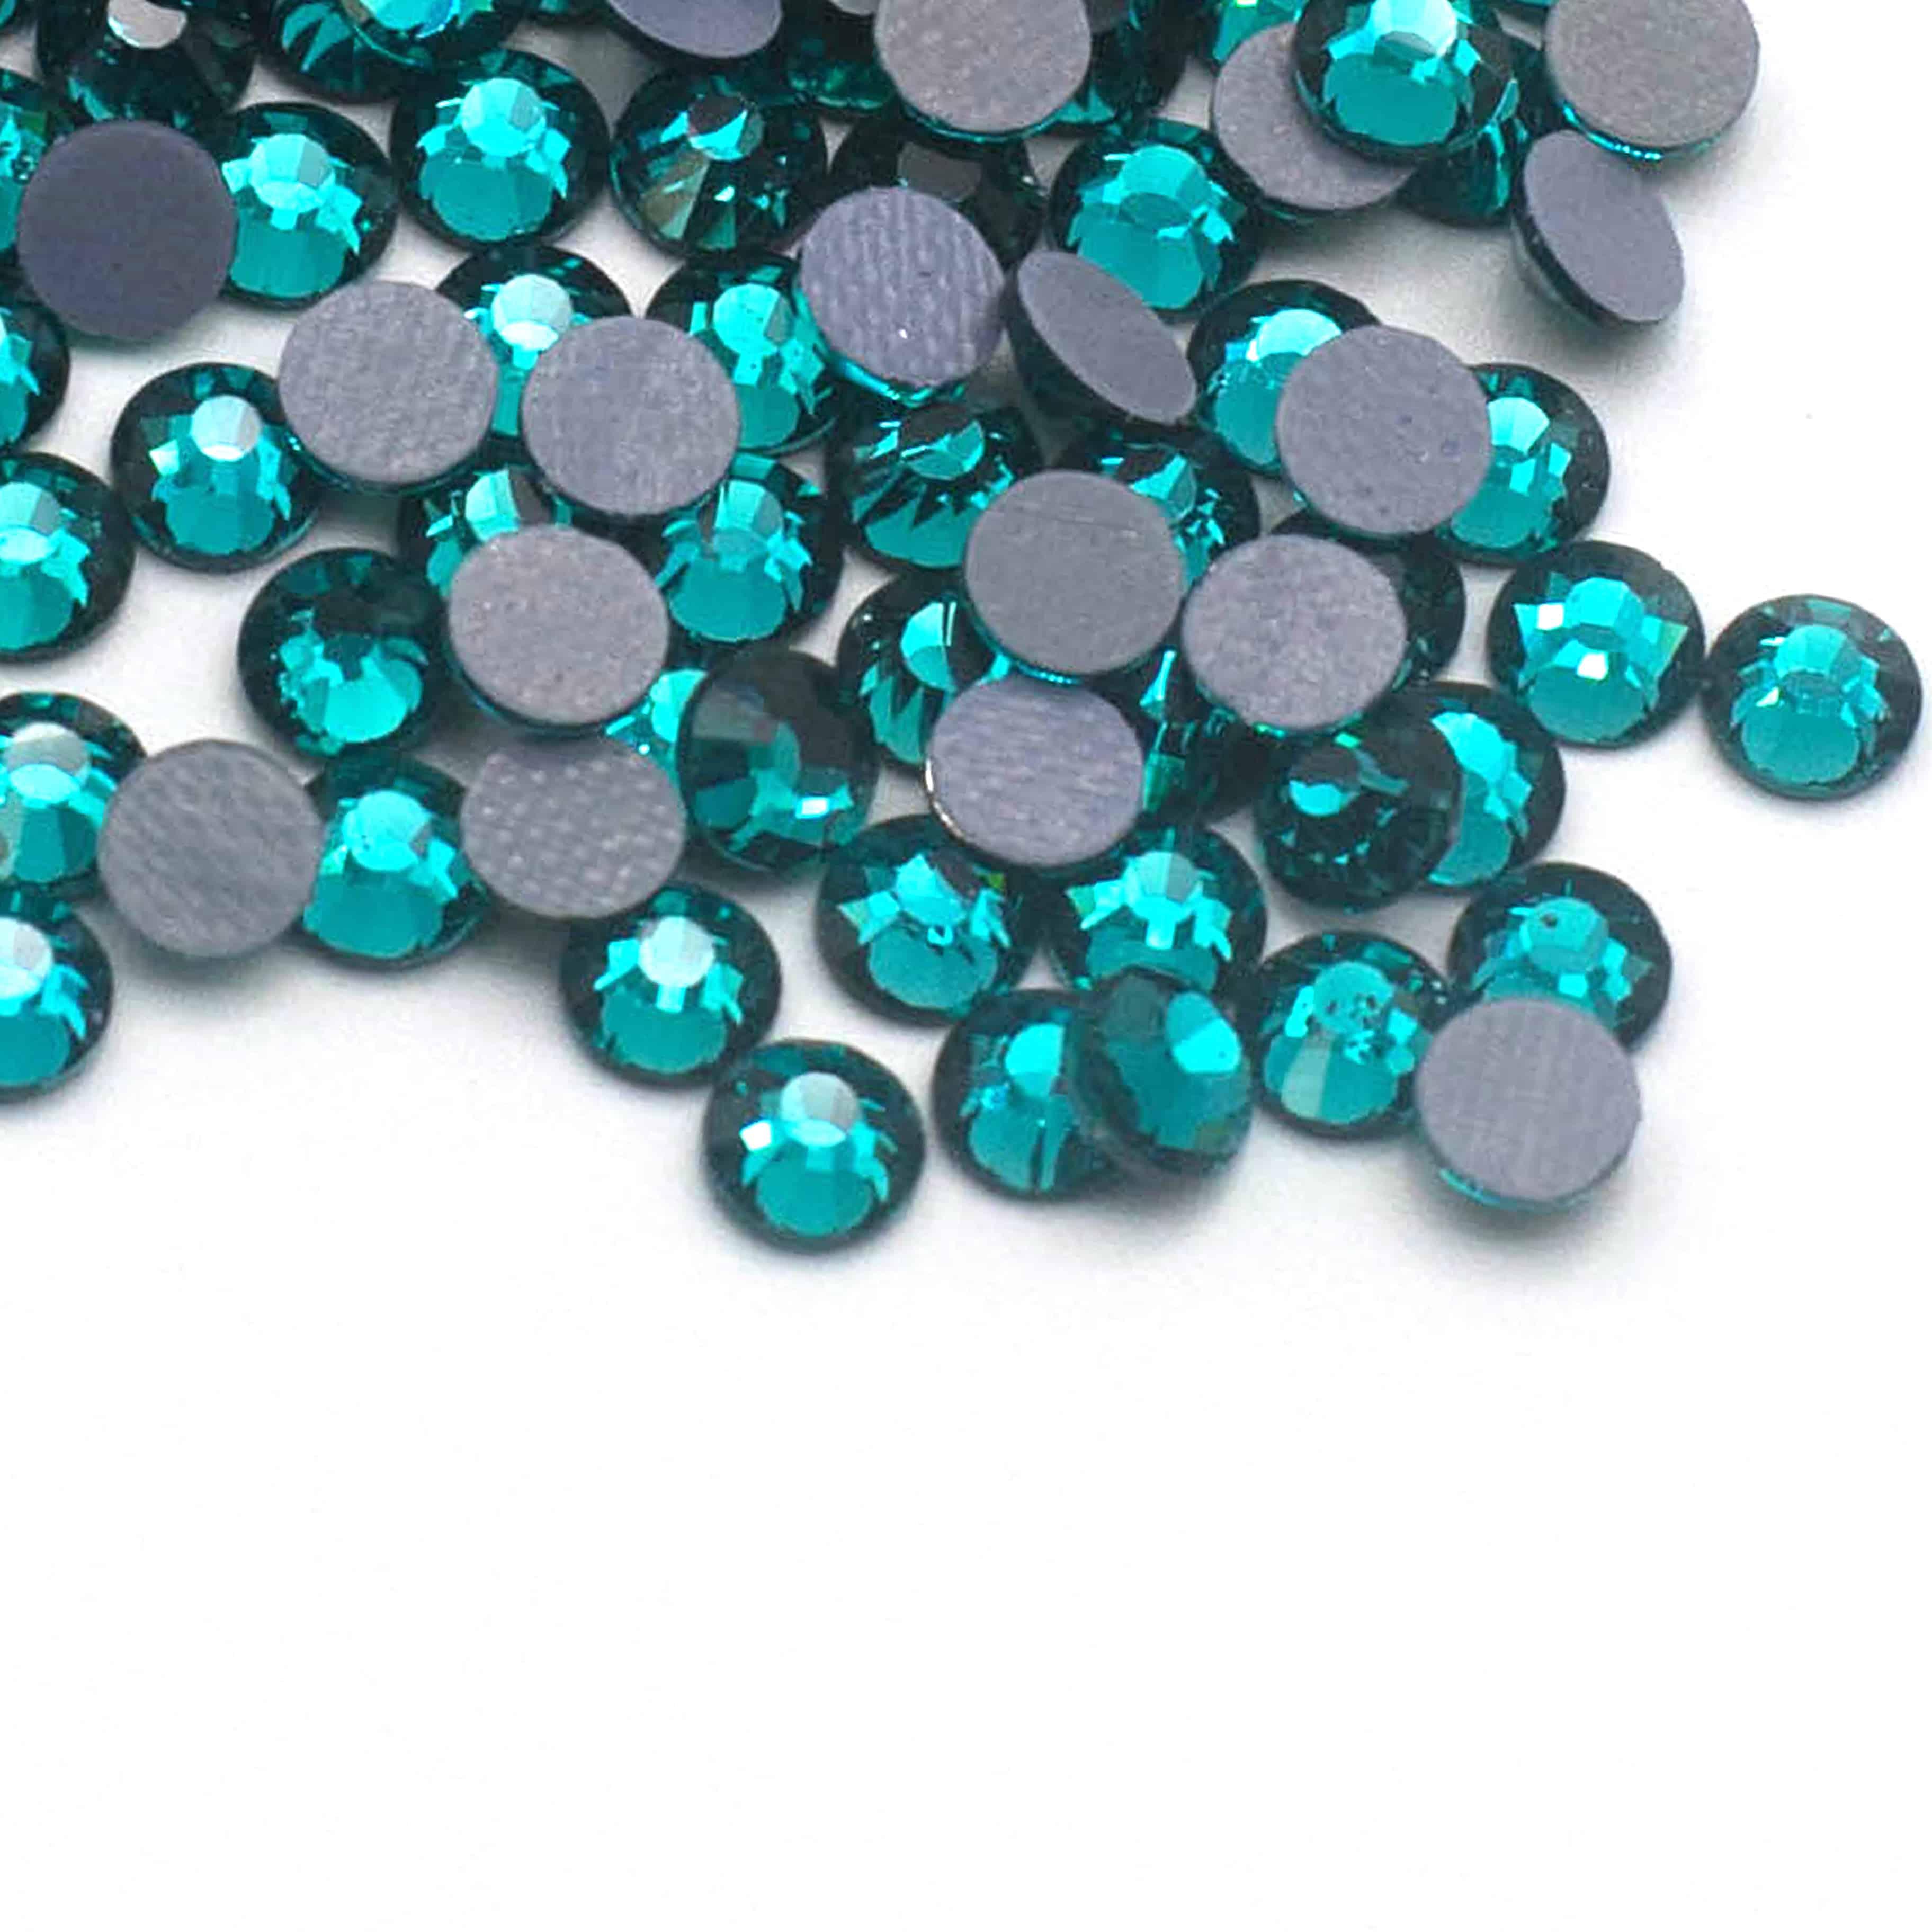 15f986b217 Premium Hotfix Rhinestones (Blue Zircon) SS16,SS20,SS30